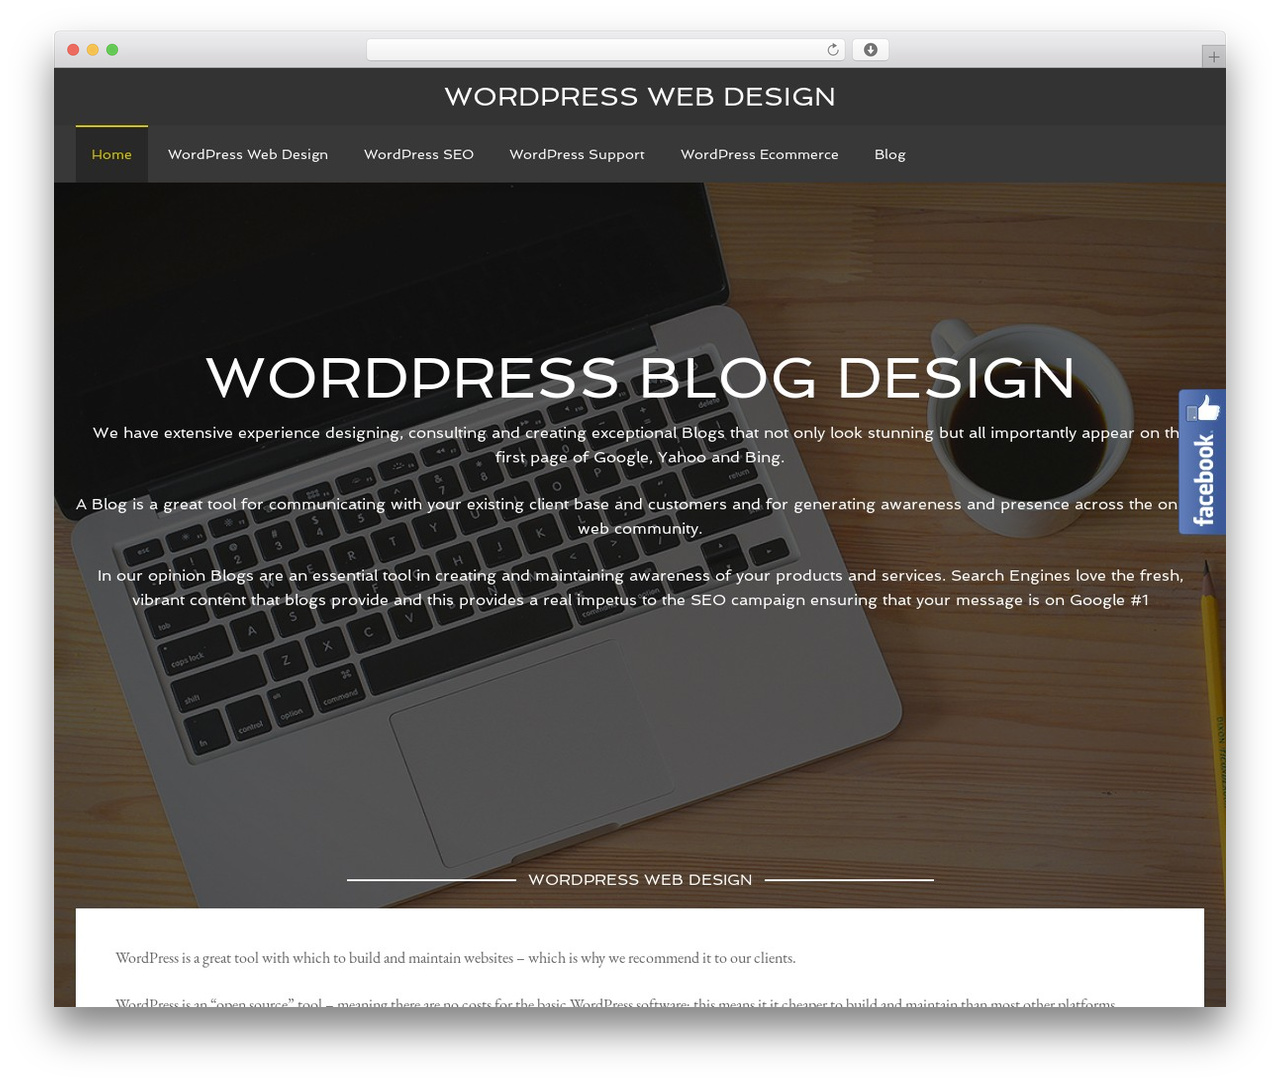 Agency Pro Theme Wordpress Template By Studiopress Wordpress Web Design Co